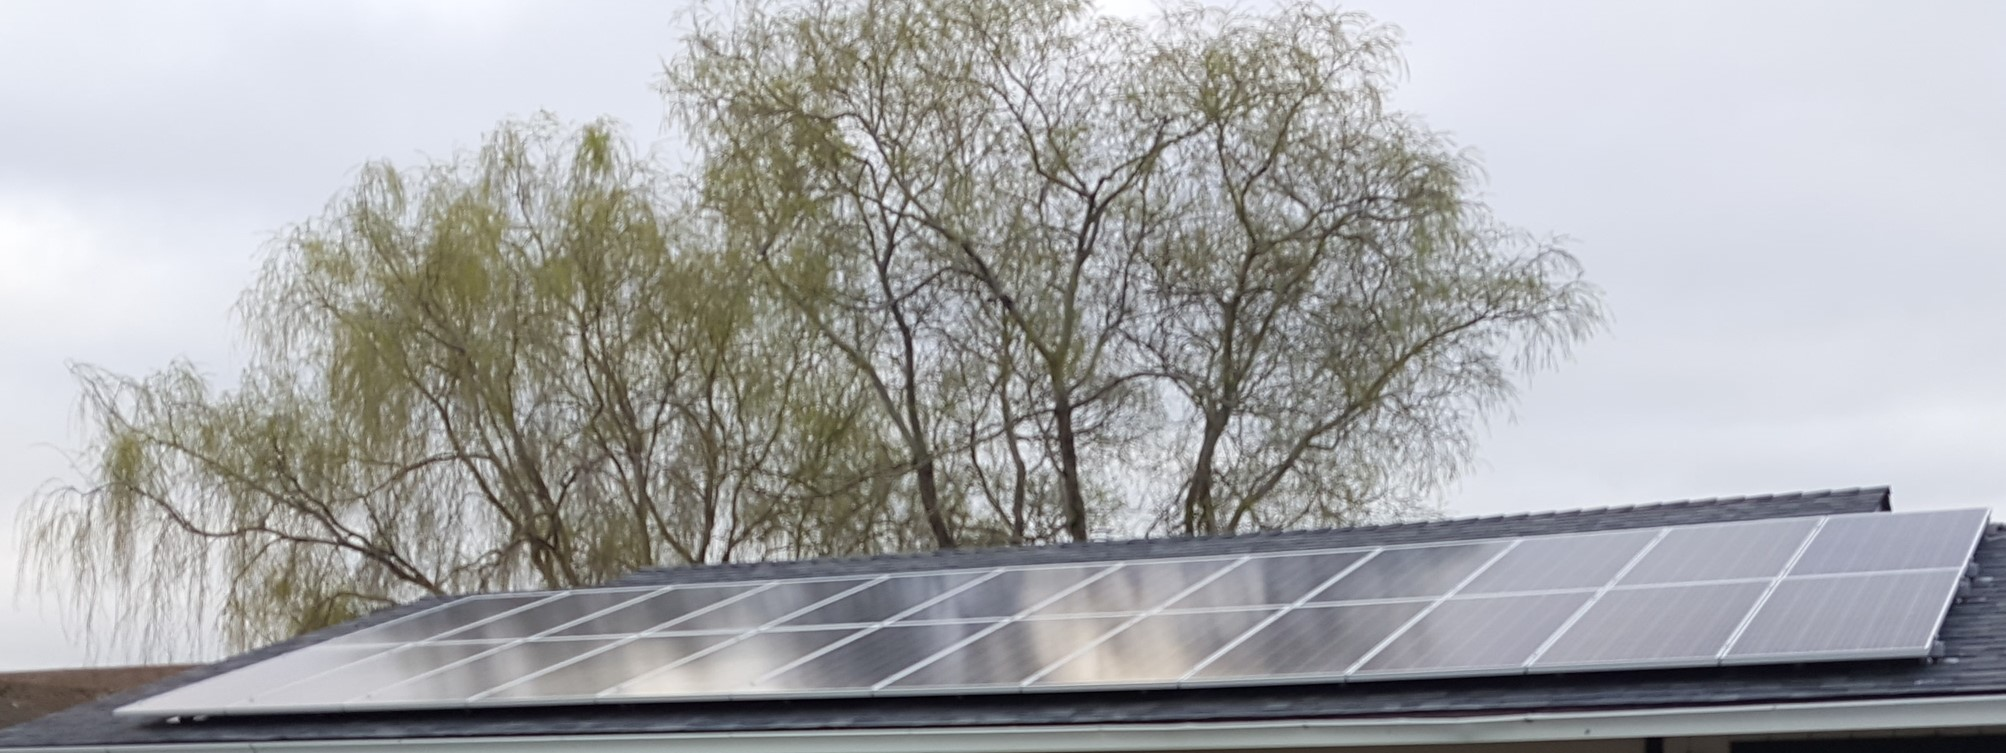 Solar.roof.panels